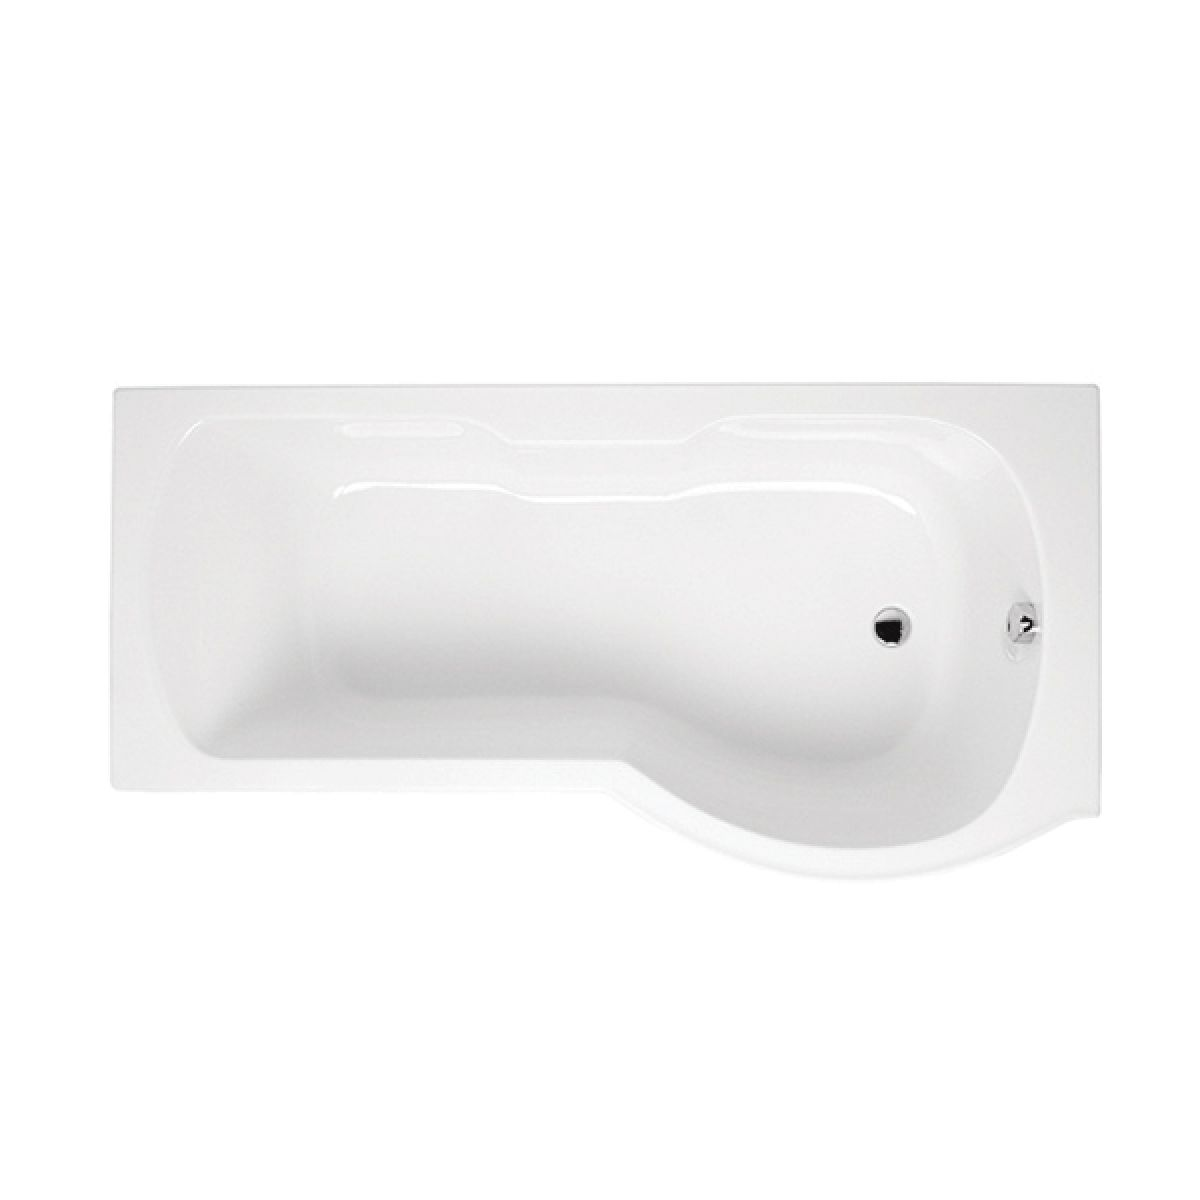 Vitra Optima P Shape Shower Bath 1700 x 700mm Right Hand